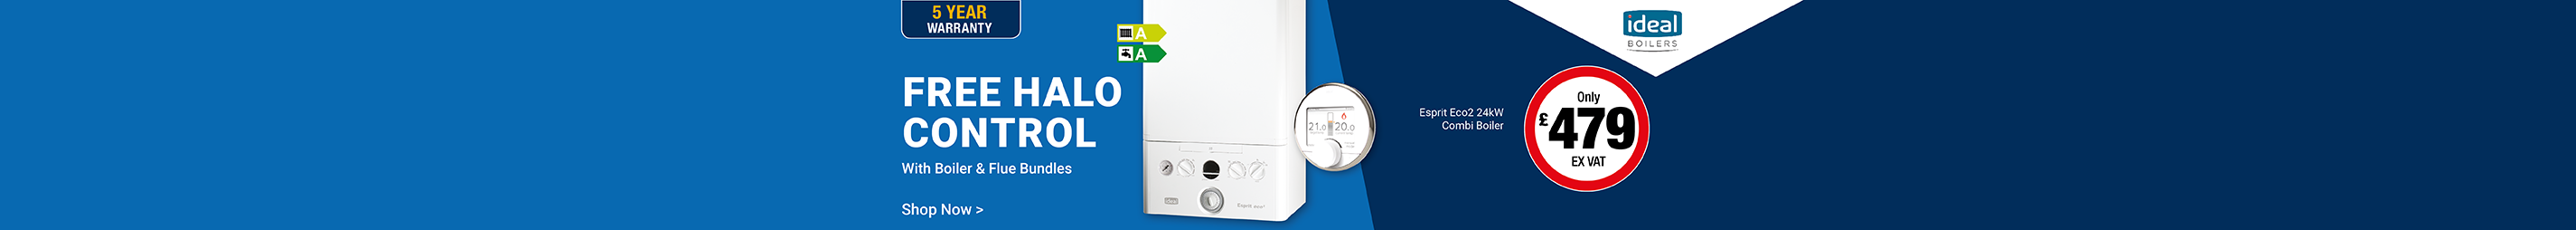 Free Control with Esprit Boiler, Flue & Filter Bundles